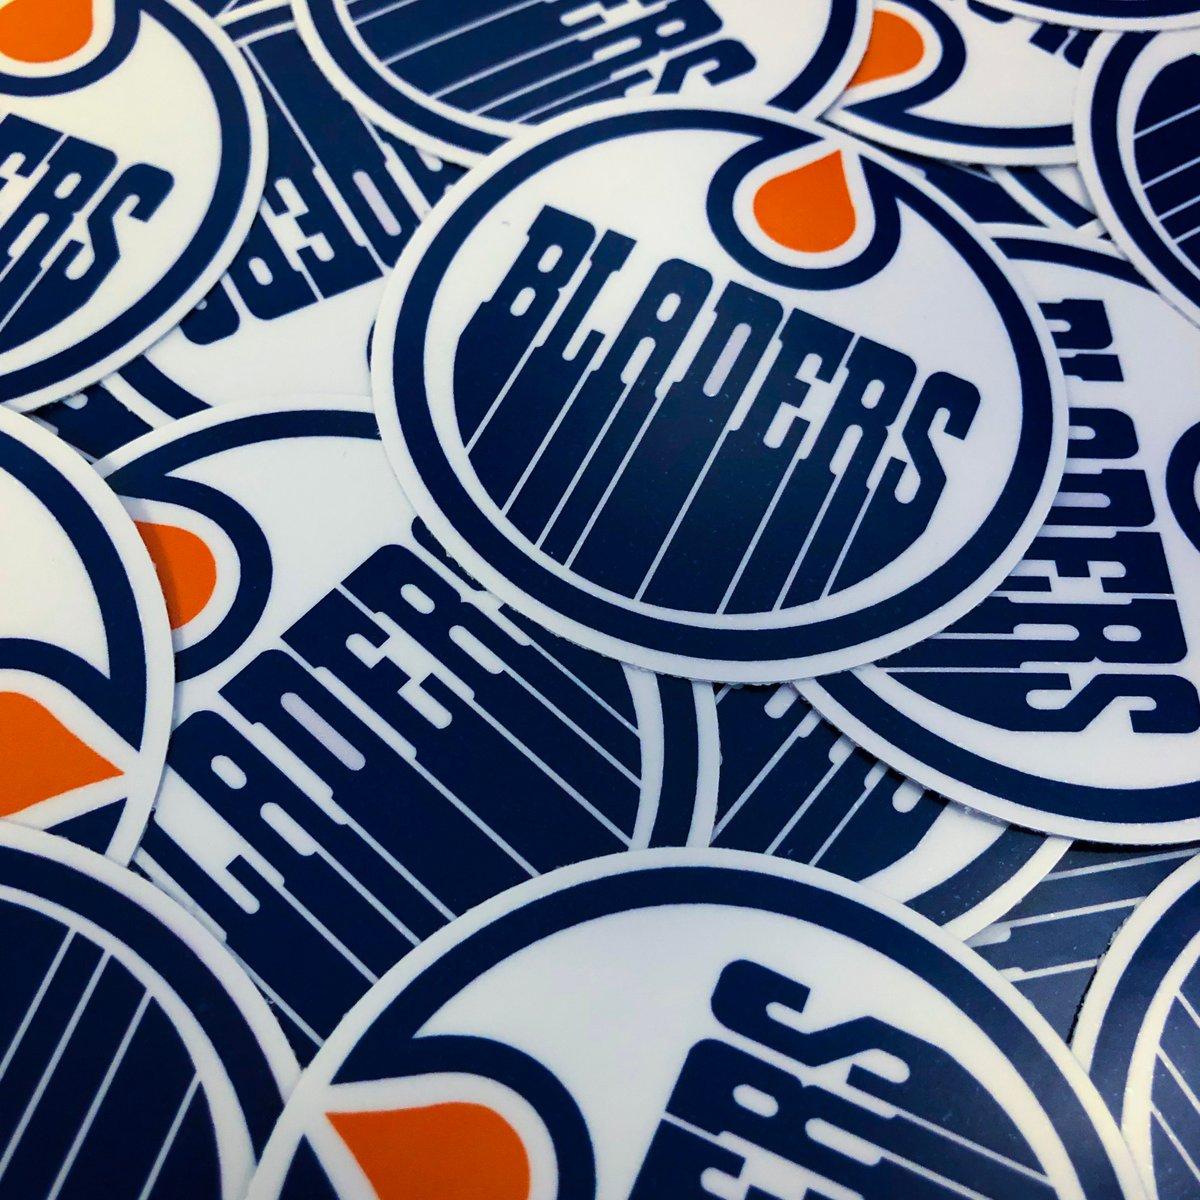 Image of Shredmonton Bladers Sticker Pack